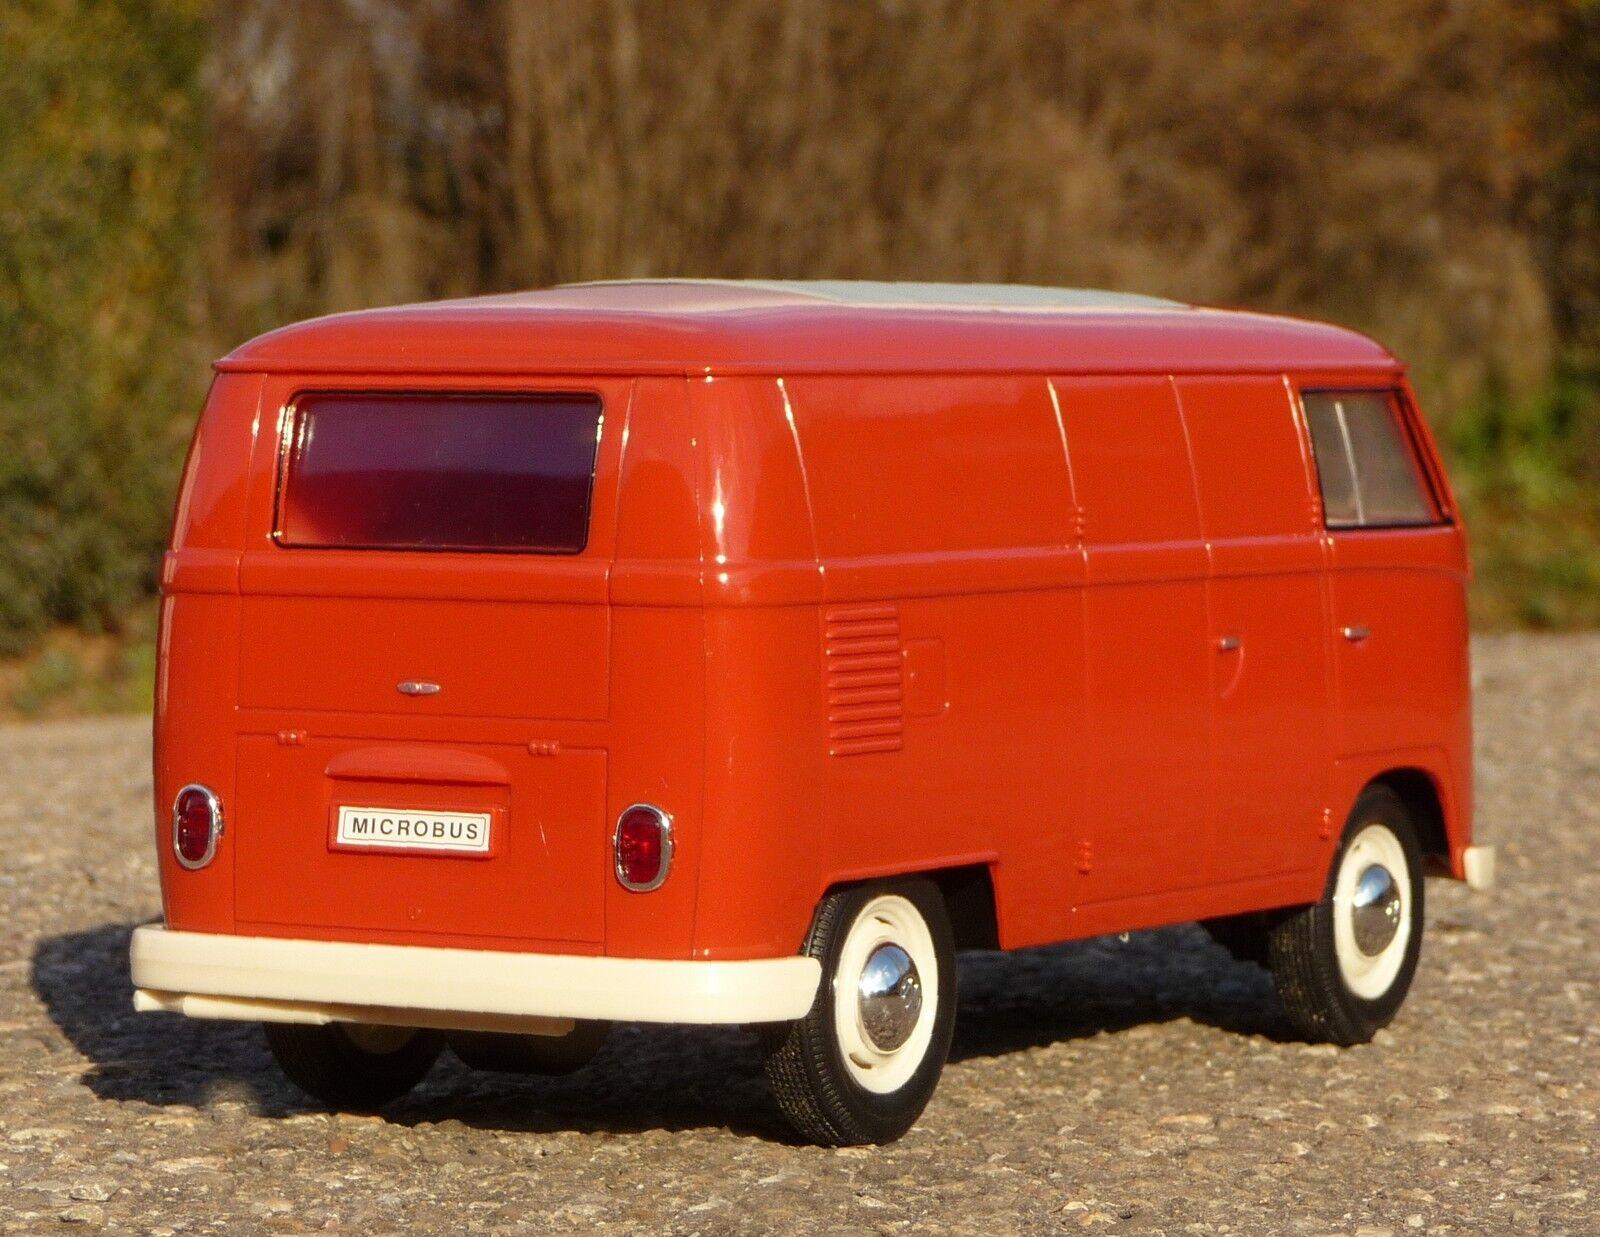 RC furgoneta VW t1 Transporter con luz longitud 26cm por control remoto 27mhz 405085